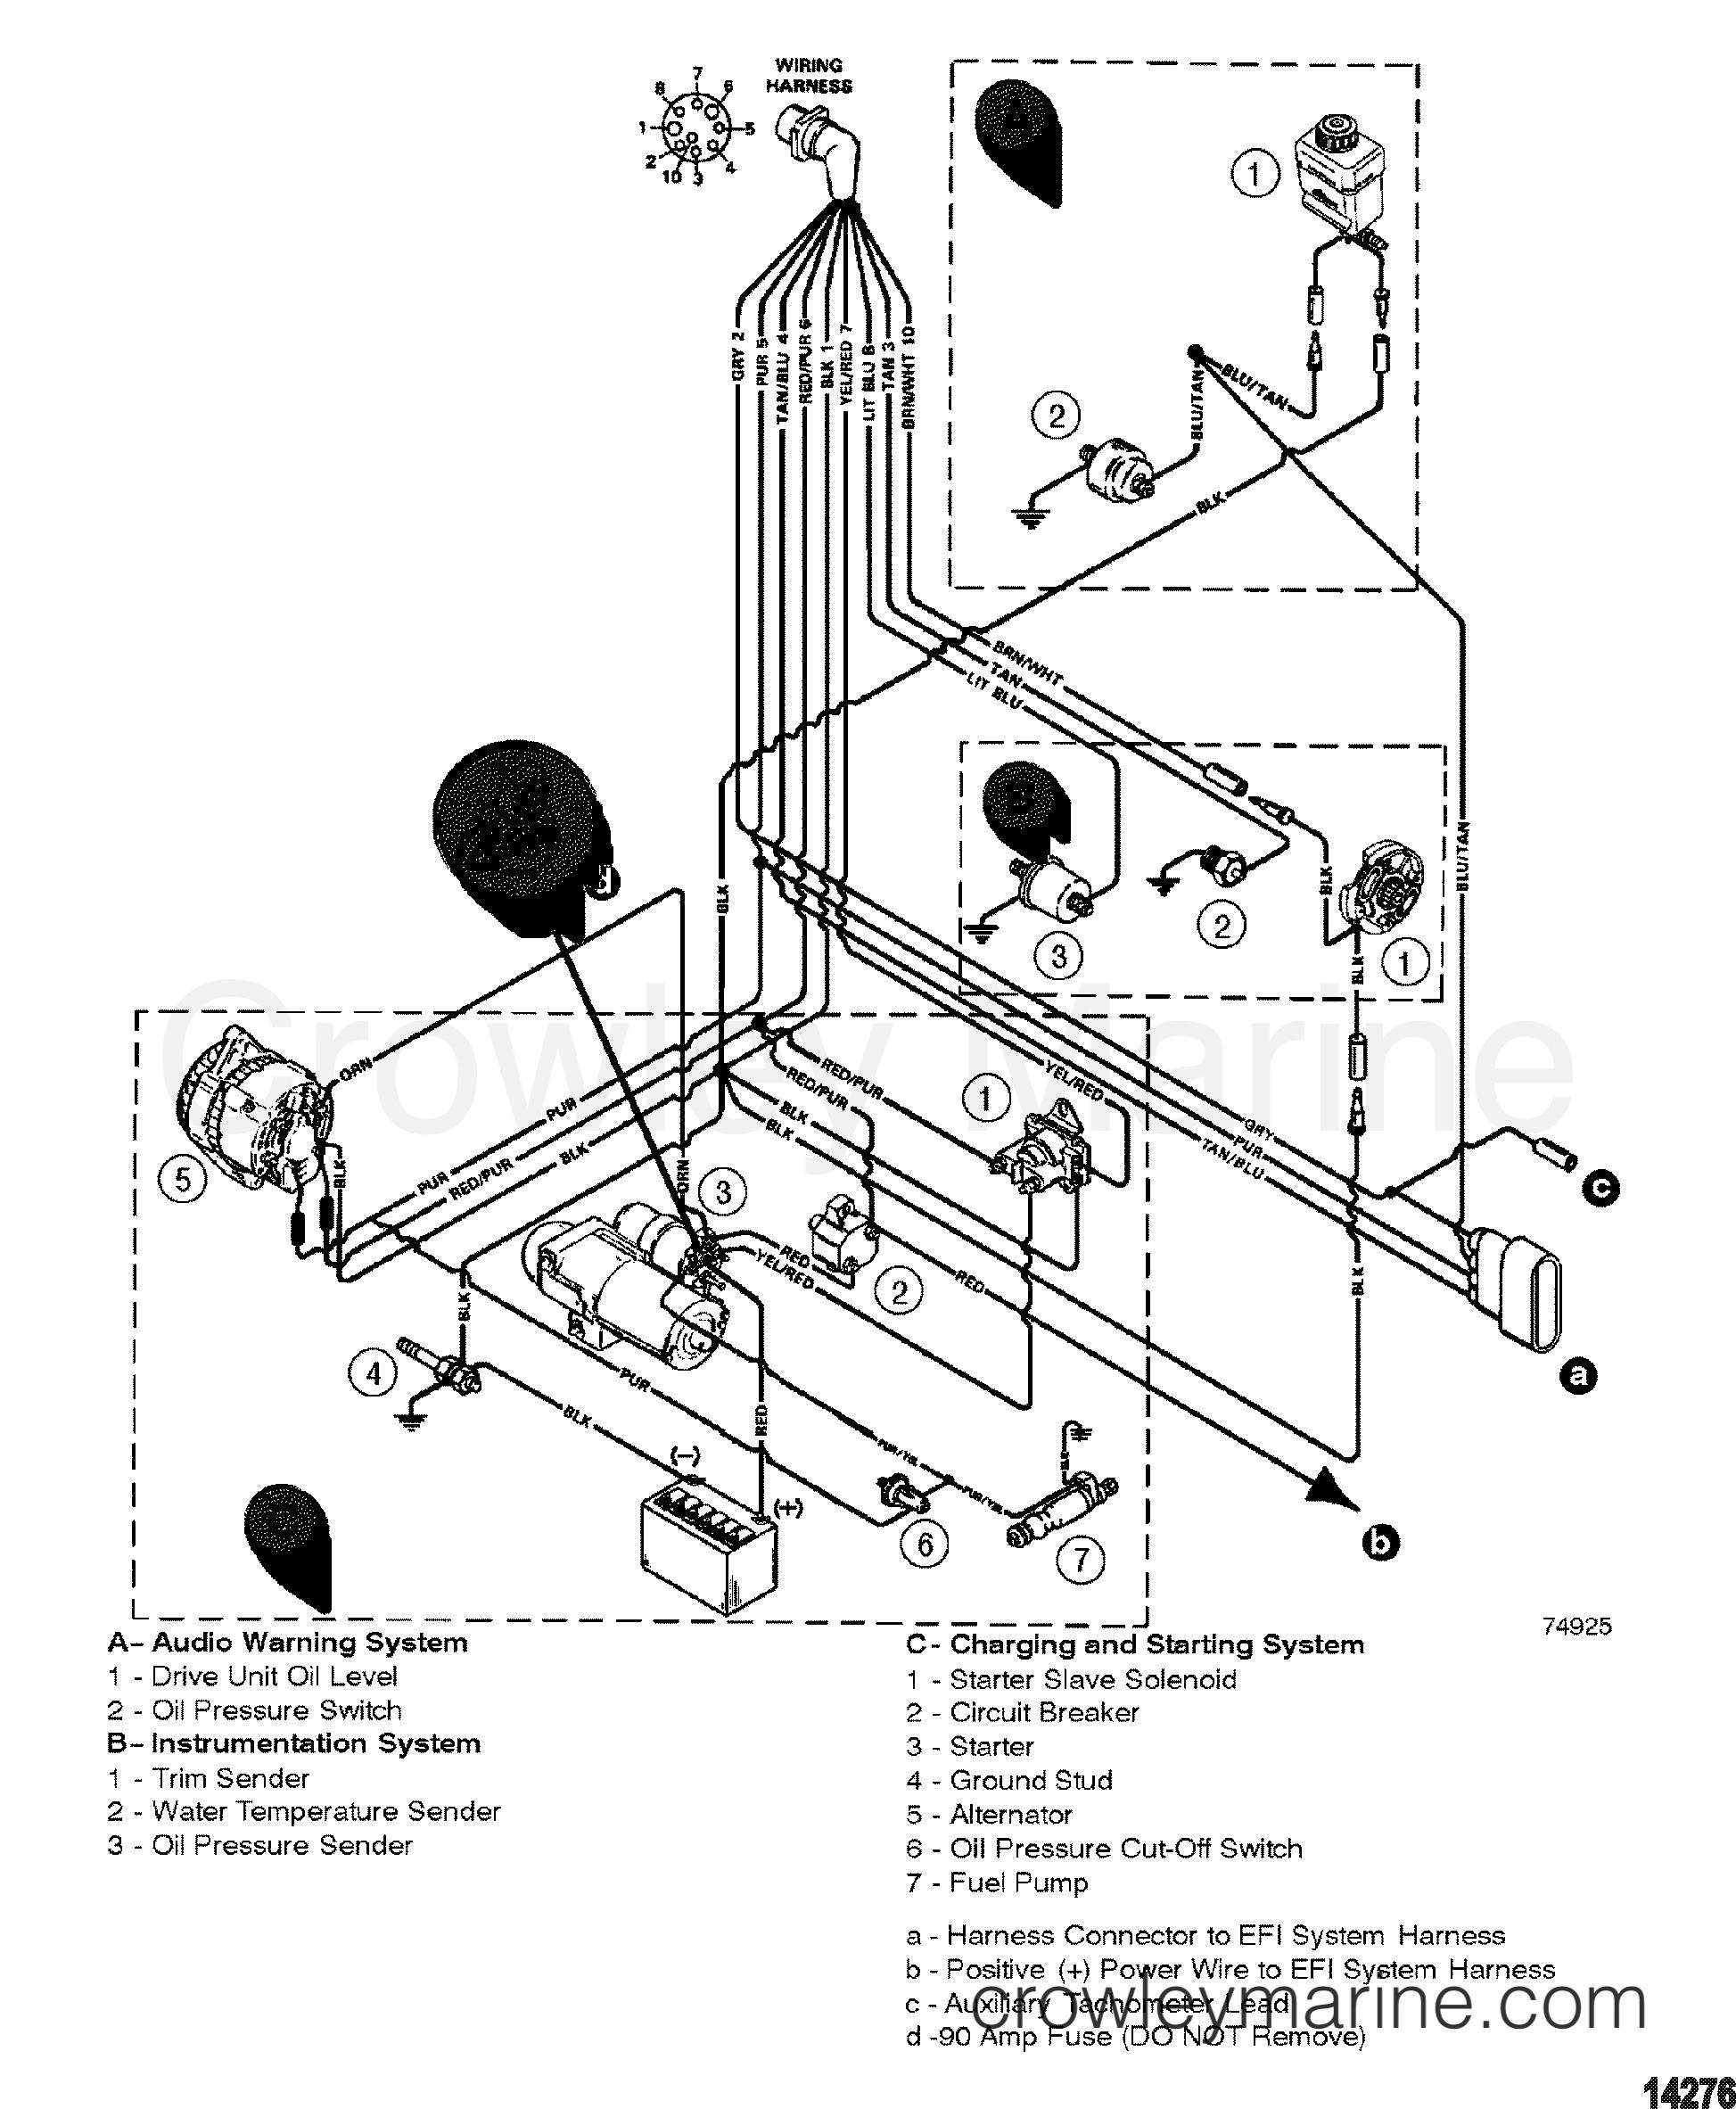 Wiring Harness(Engine) - 1998 Mercruiser 4.3L [Alpha Efi] 4231017L1 - Mercruiser 4.3 Wiring Diagram